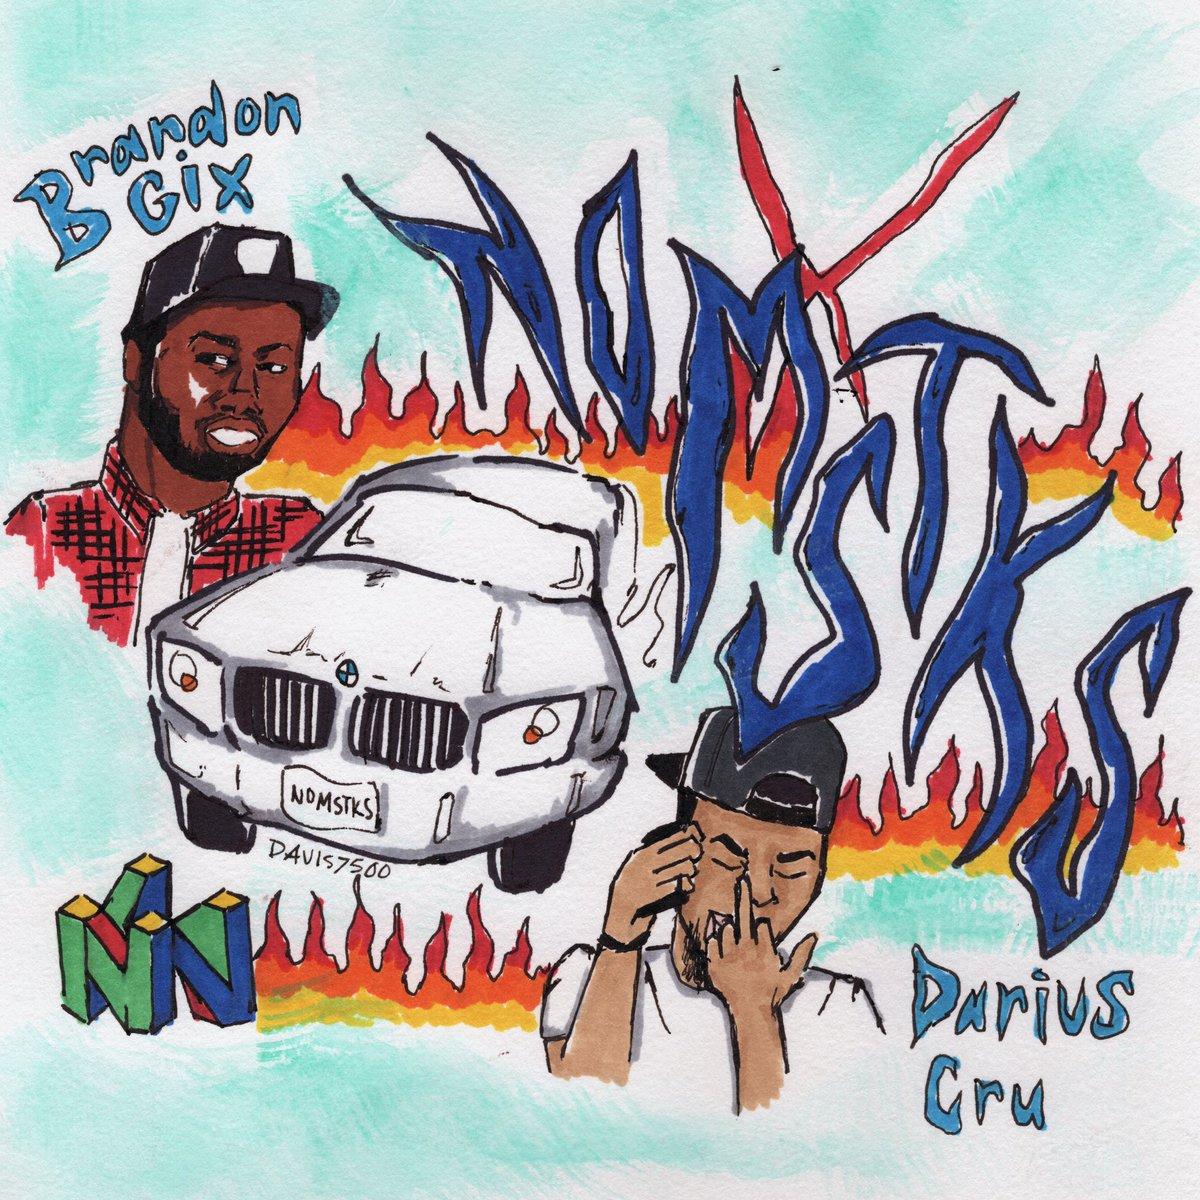 "New Music: NOMSTKS (Darius Cru x Brandon Gix) – ""NOMSTKS"" [EP]"